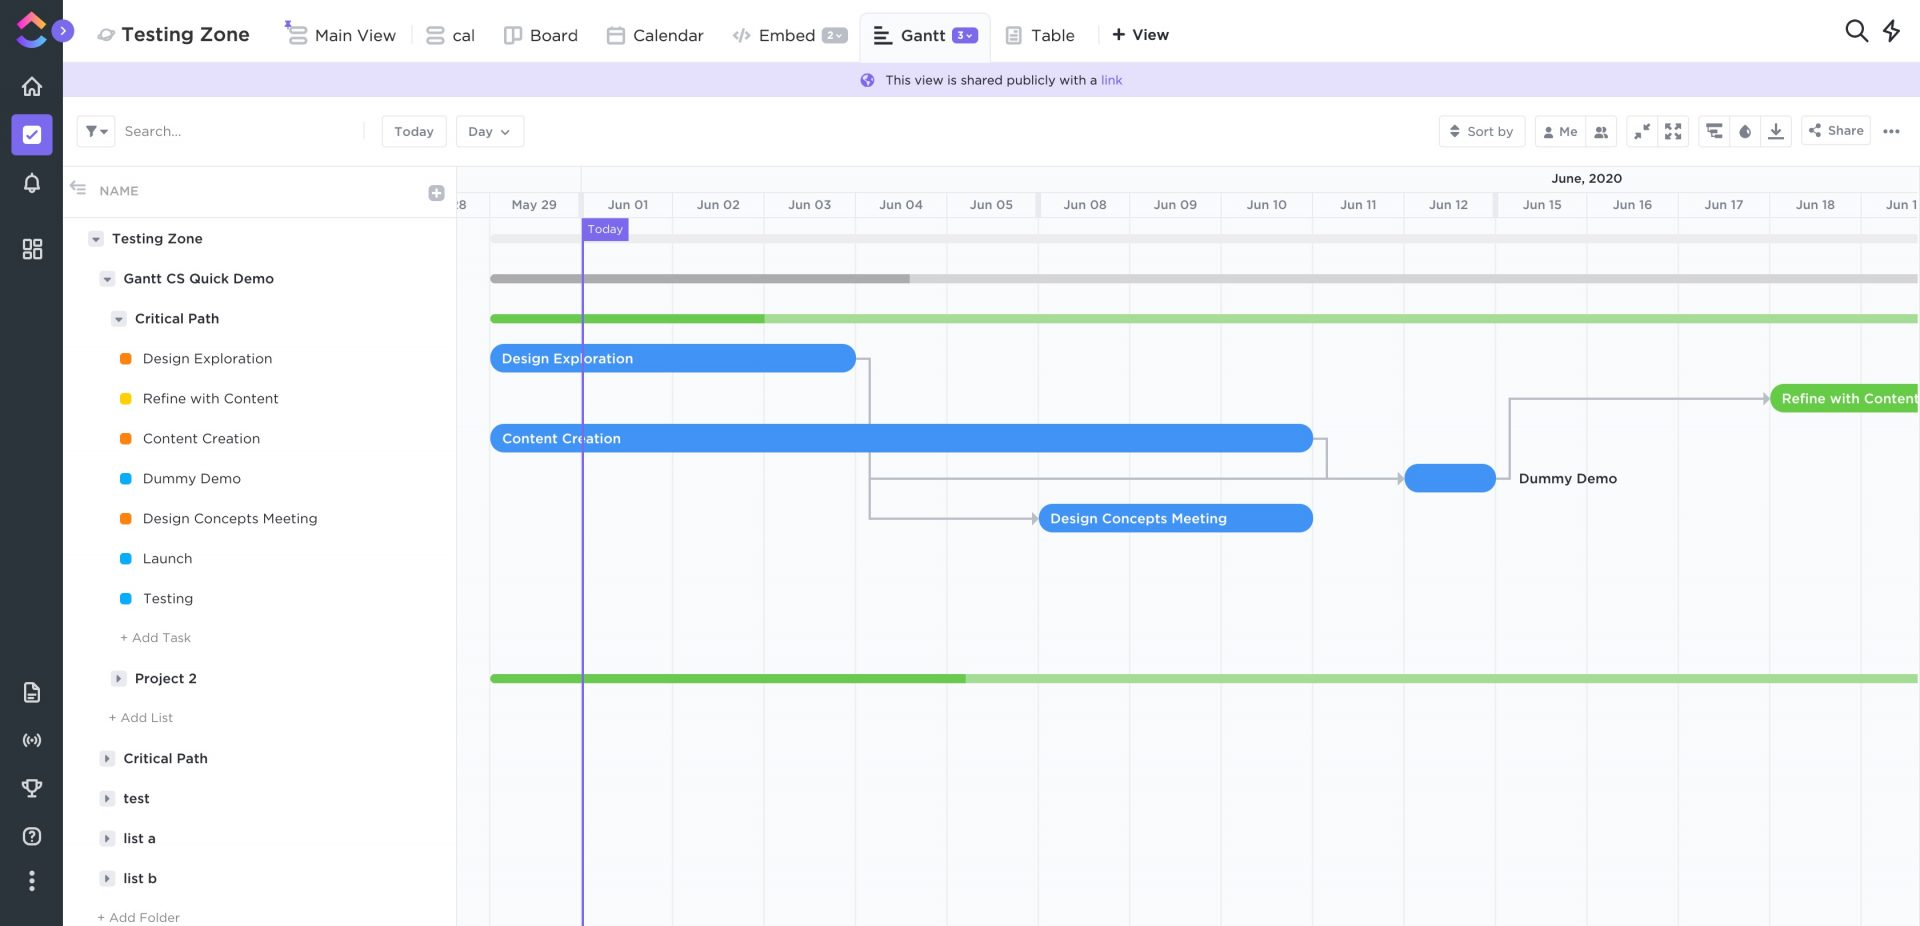 gantt chart in ClickUp